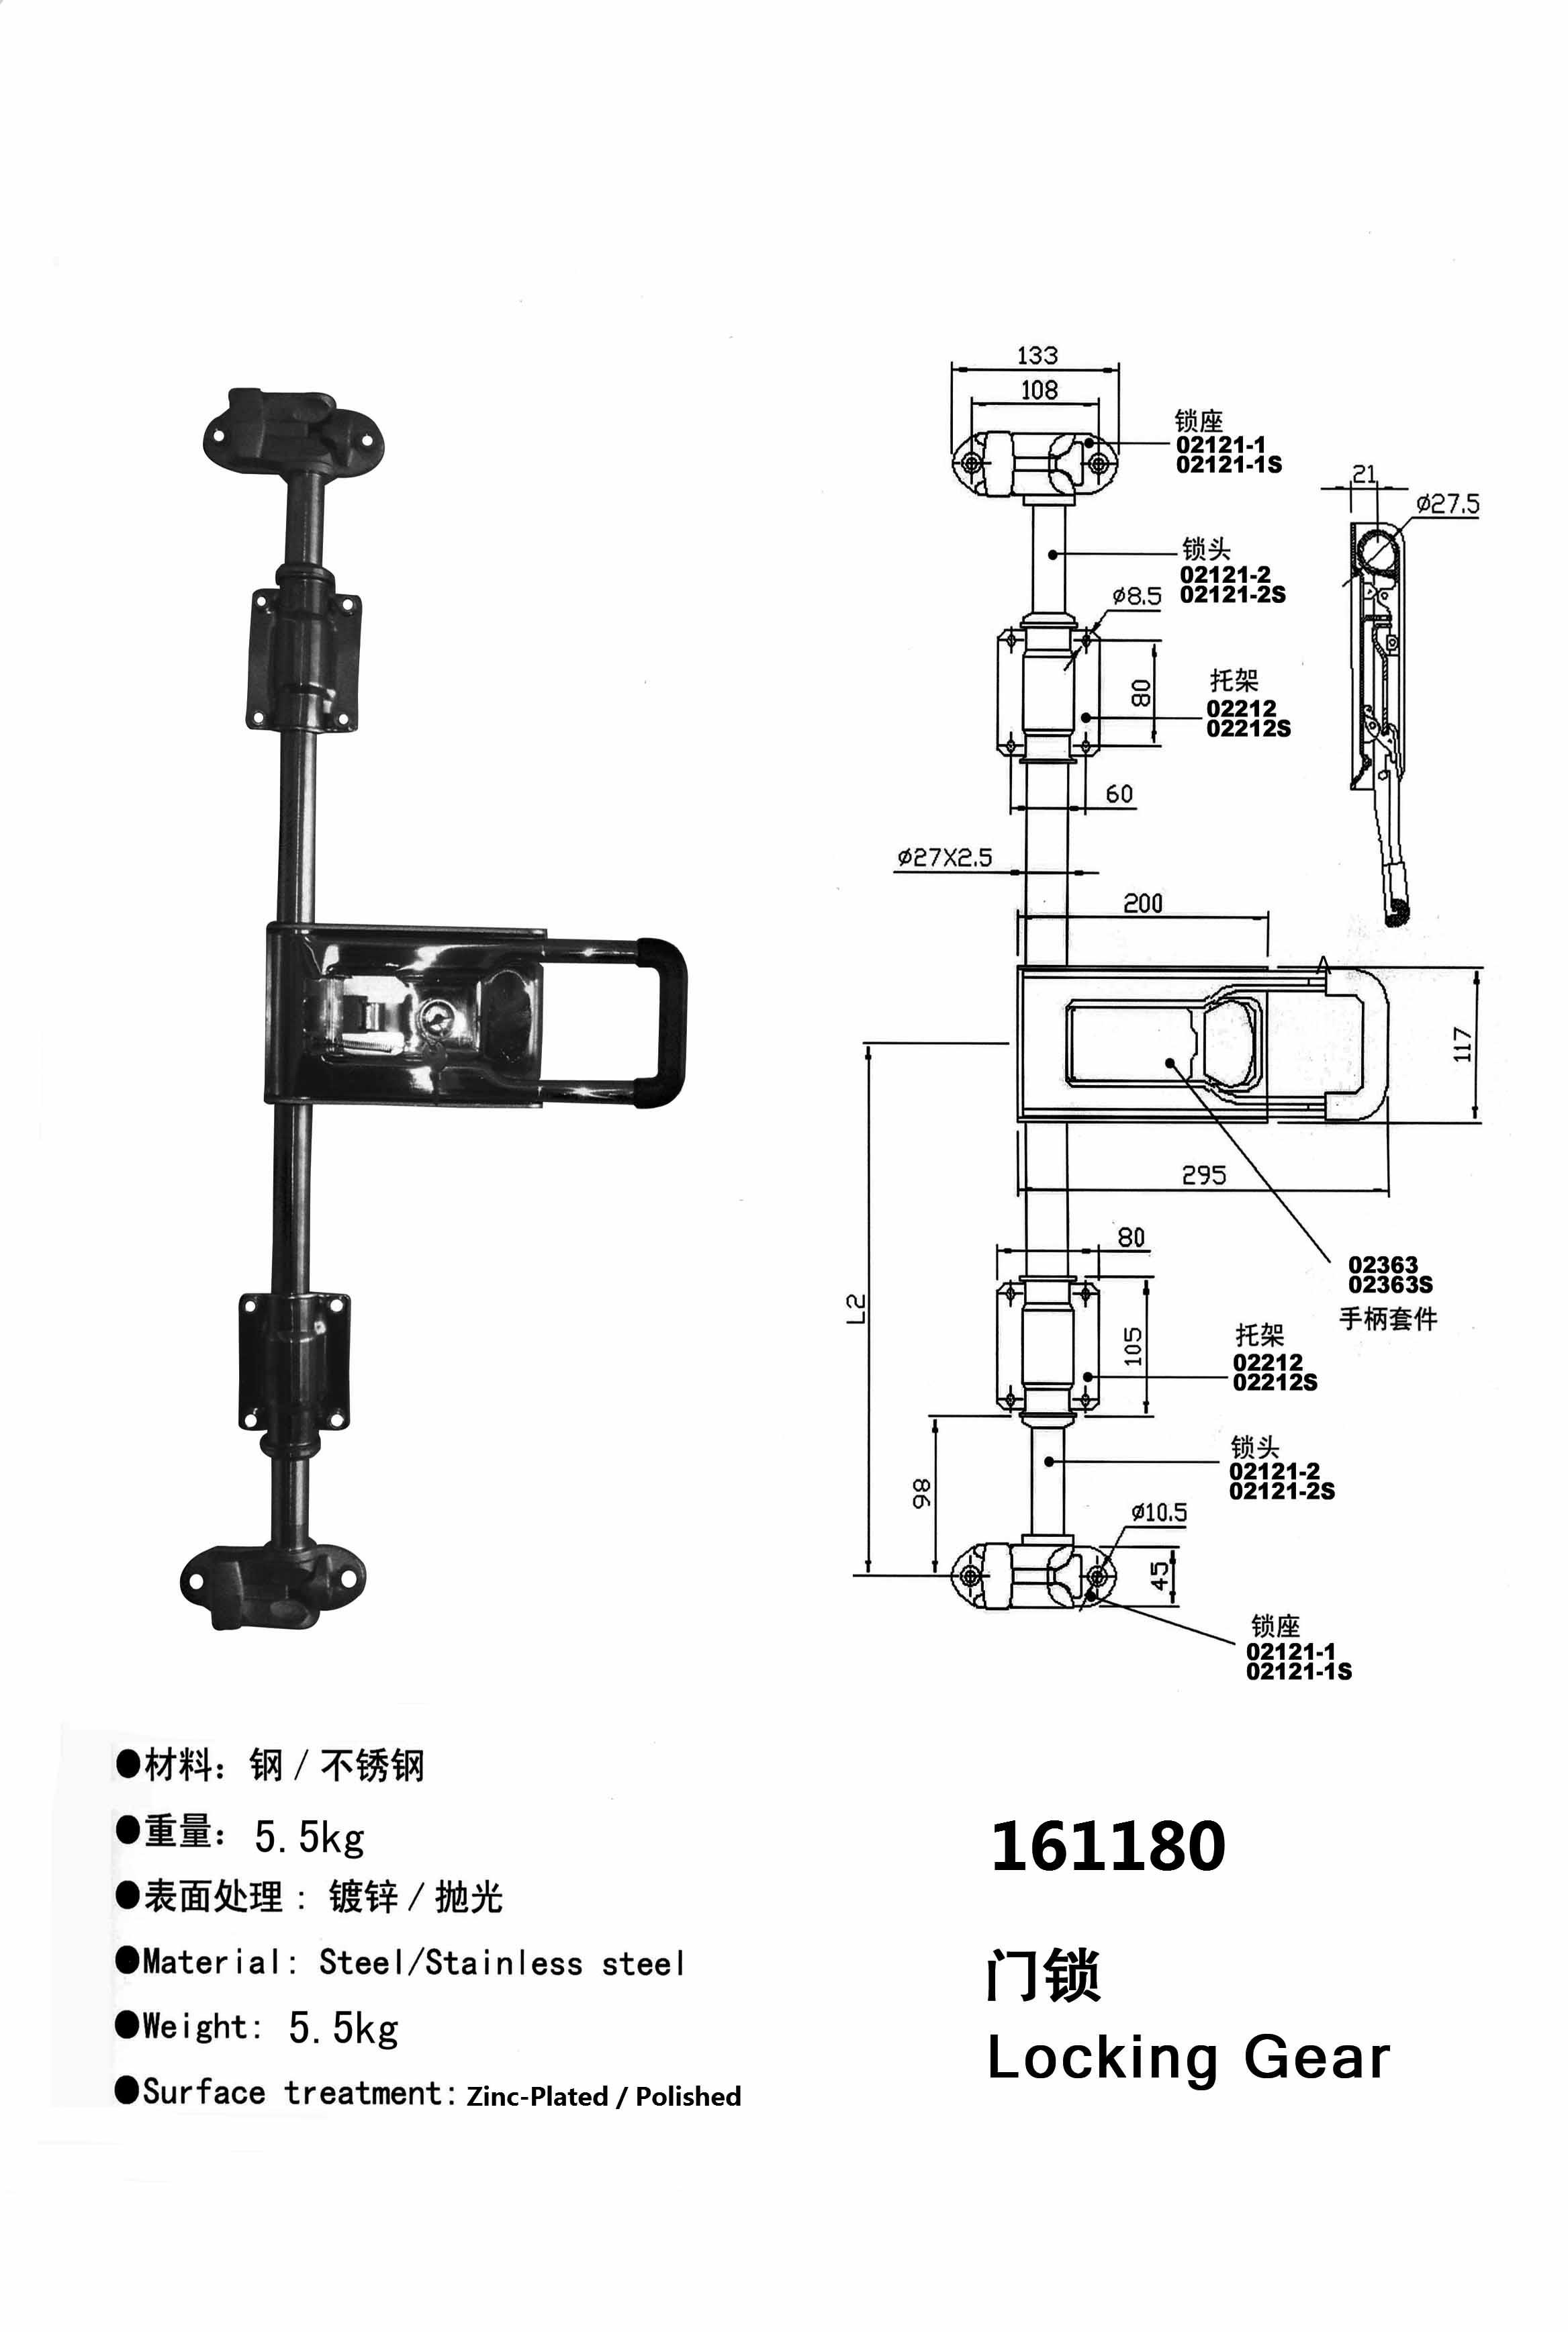 KS161180